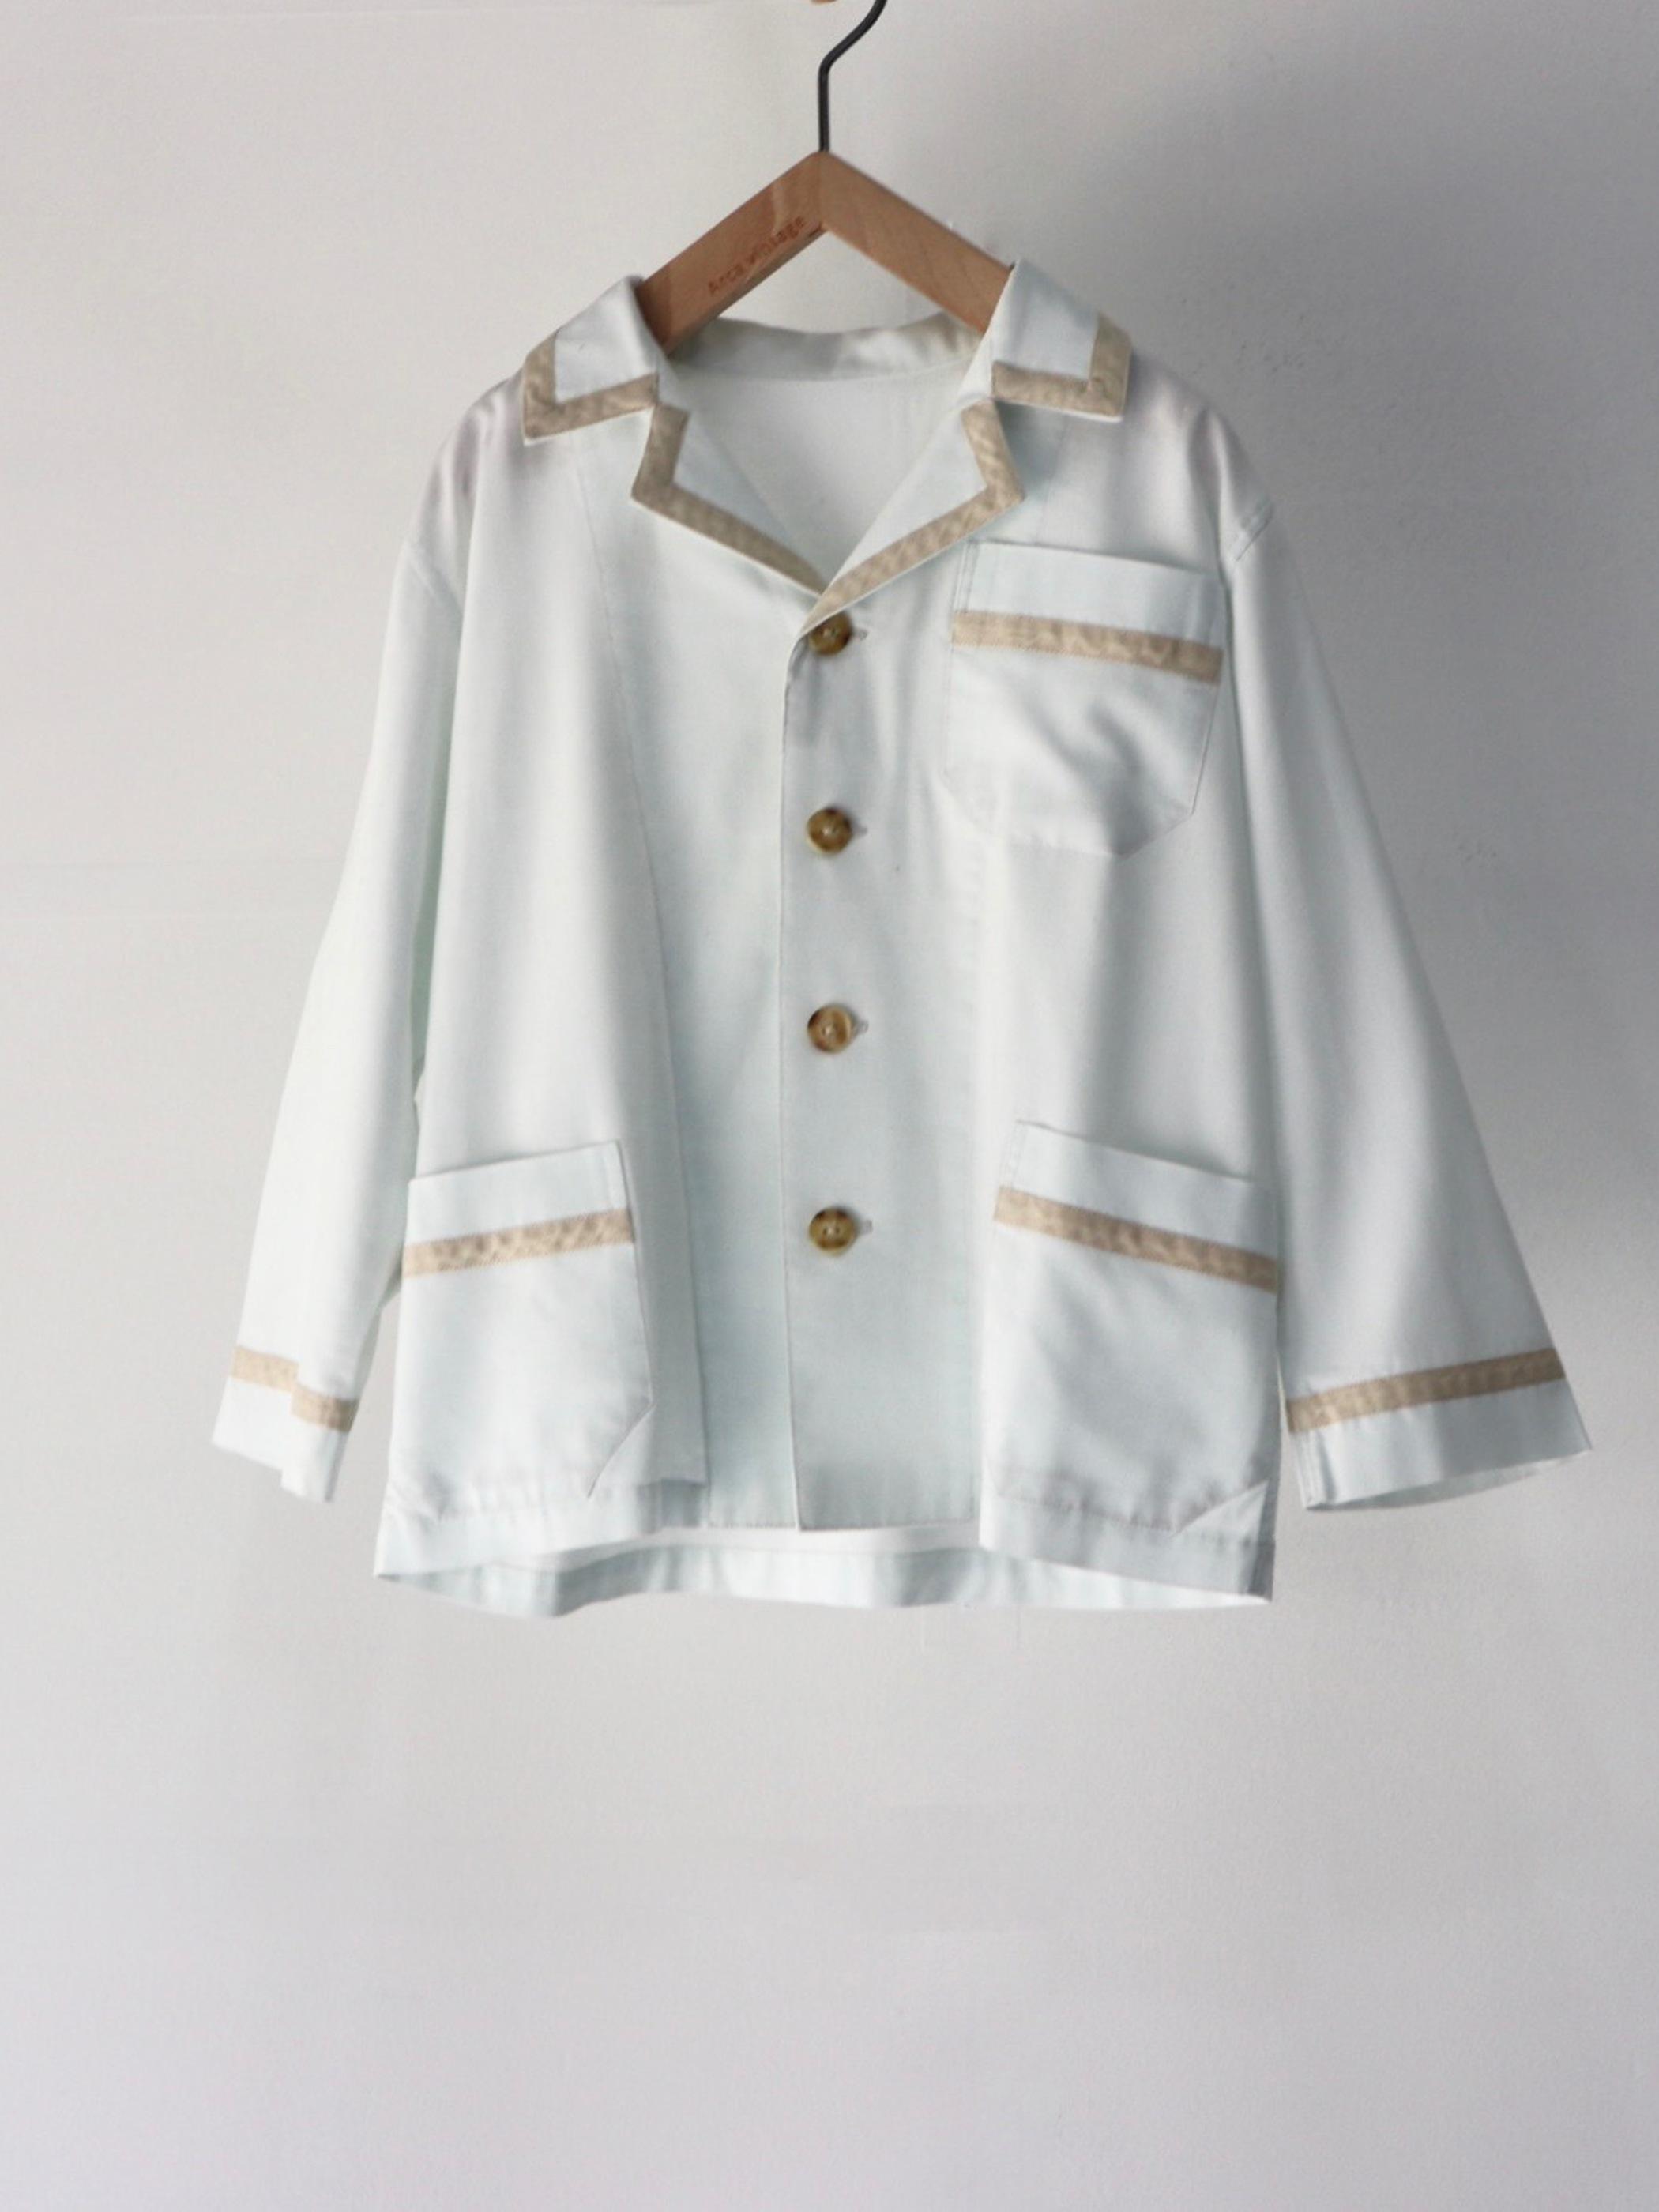 Kids opencollar shirt